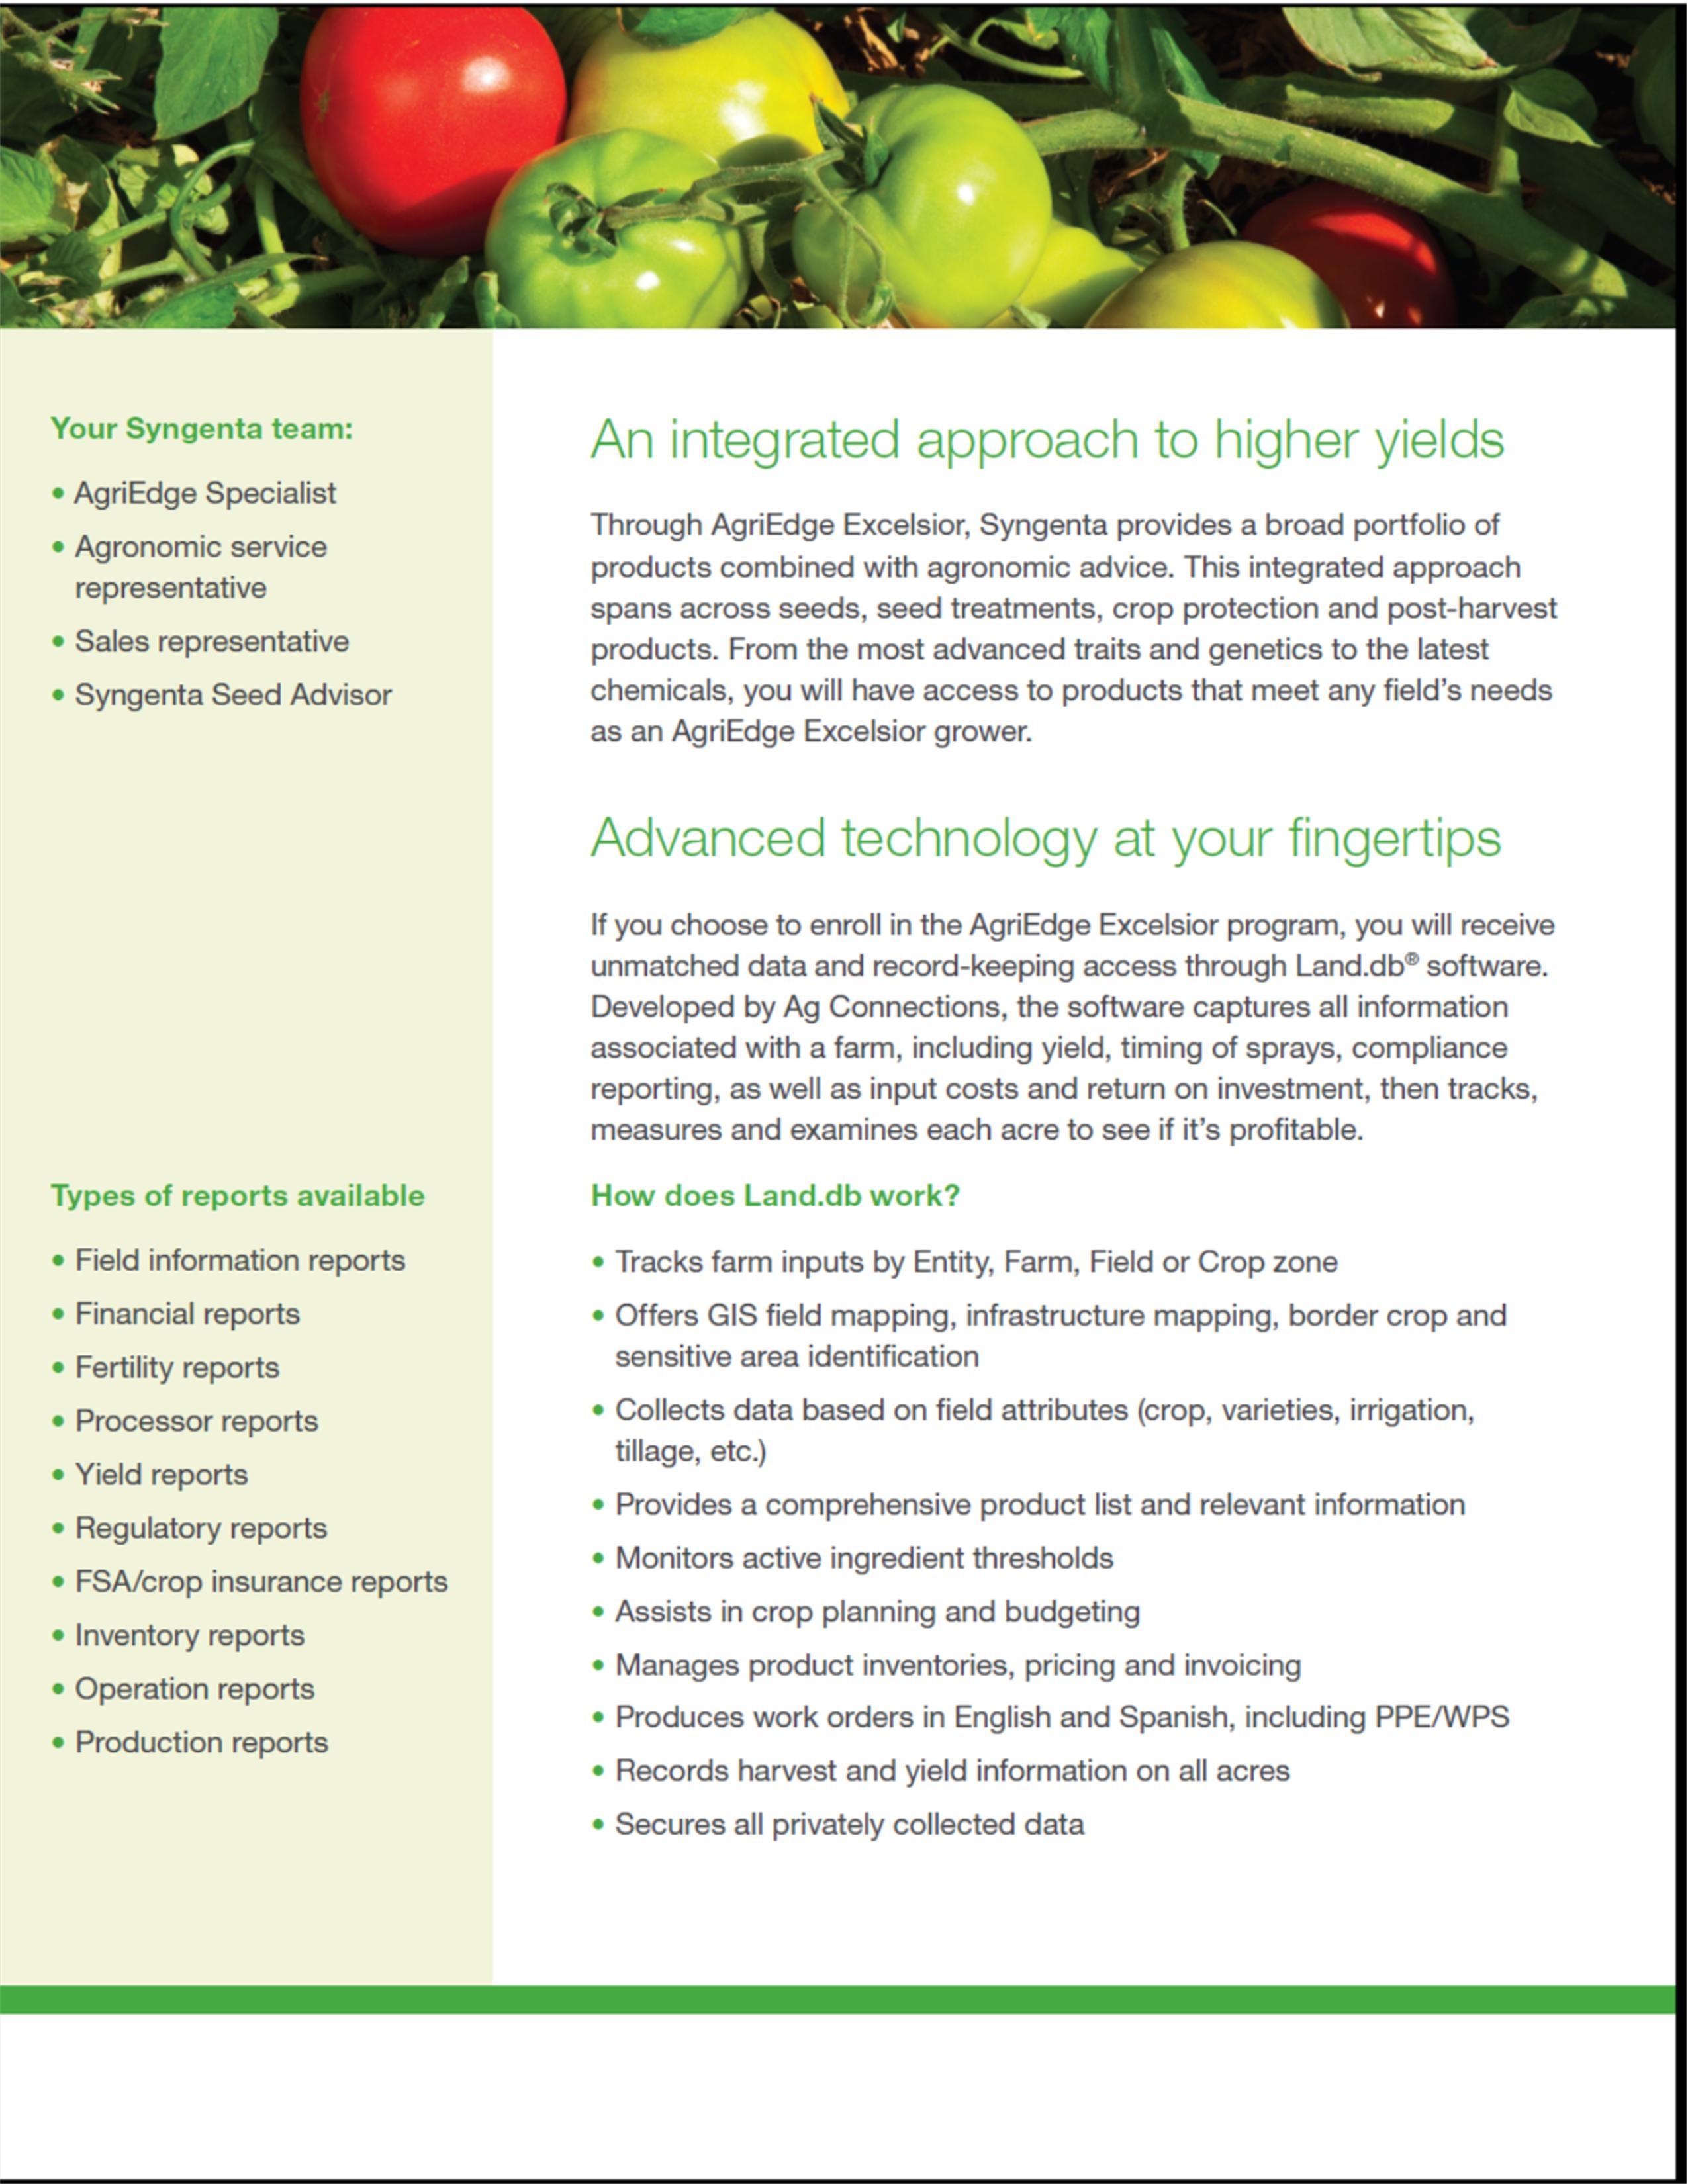 AgriEdge-Excelsior-Multicrop-AgriEdge-Excelsior-Brochure2